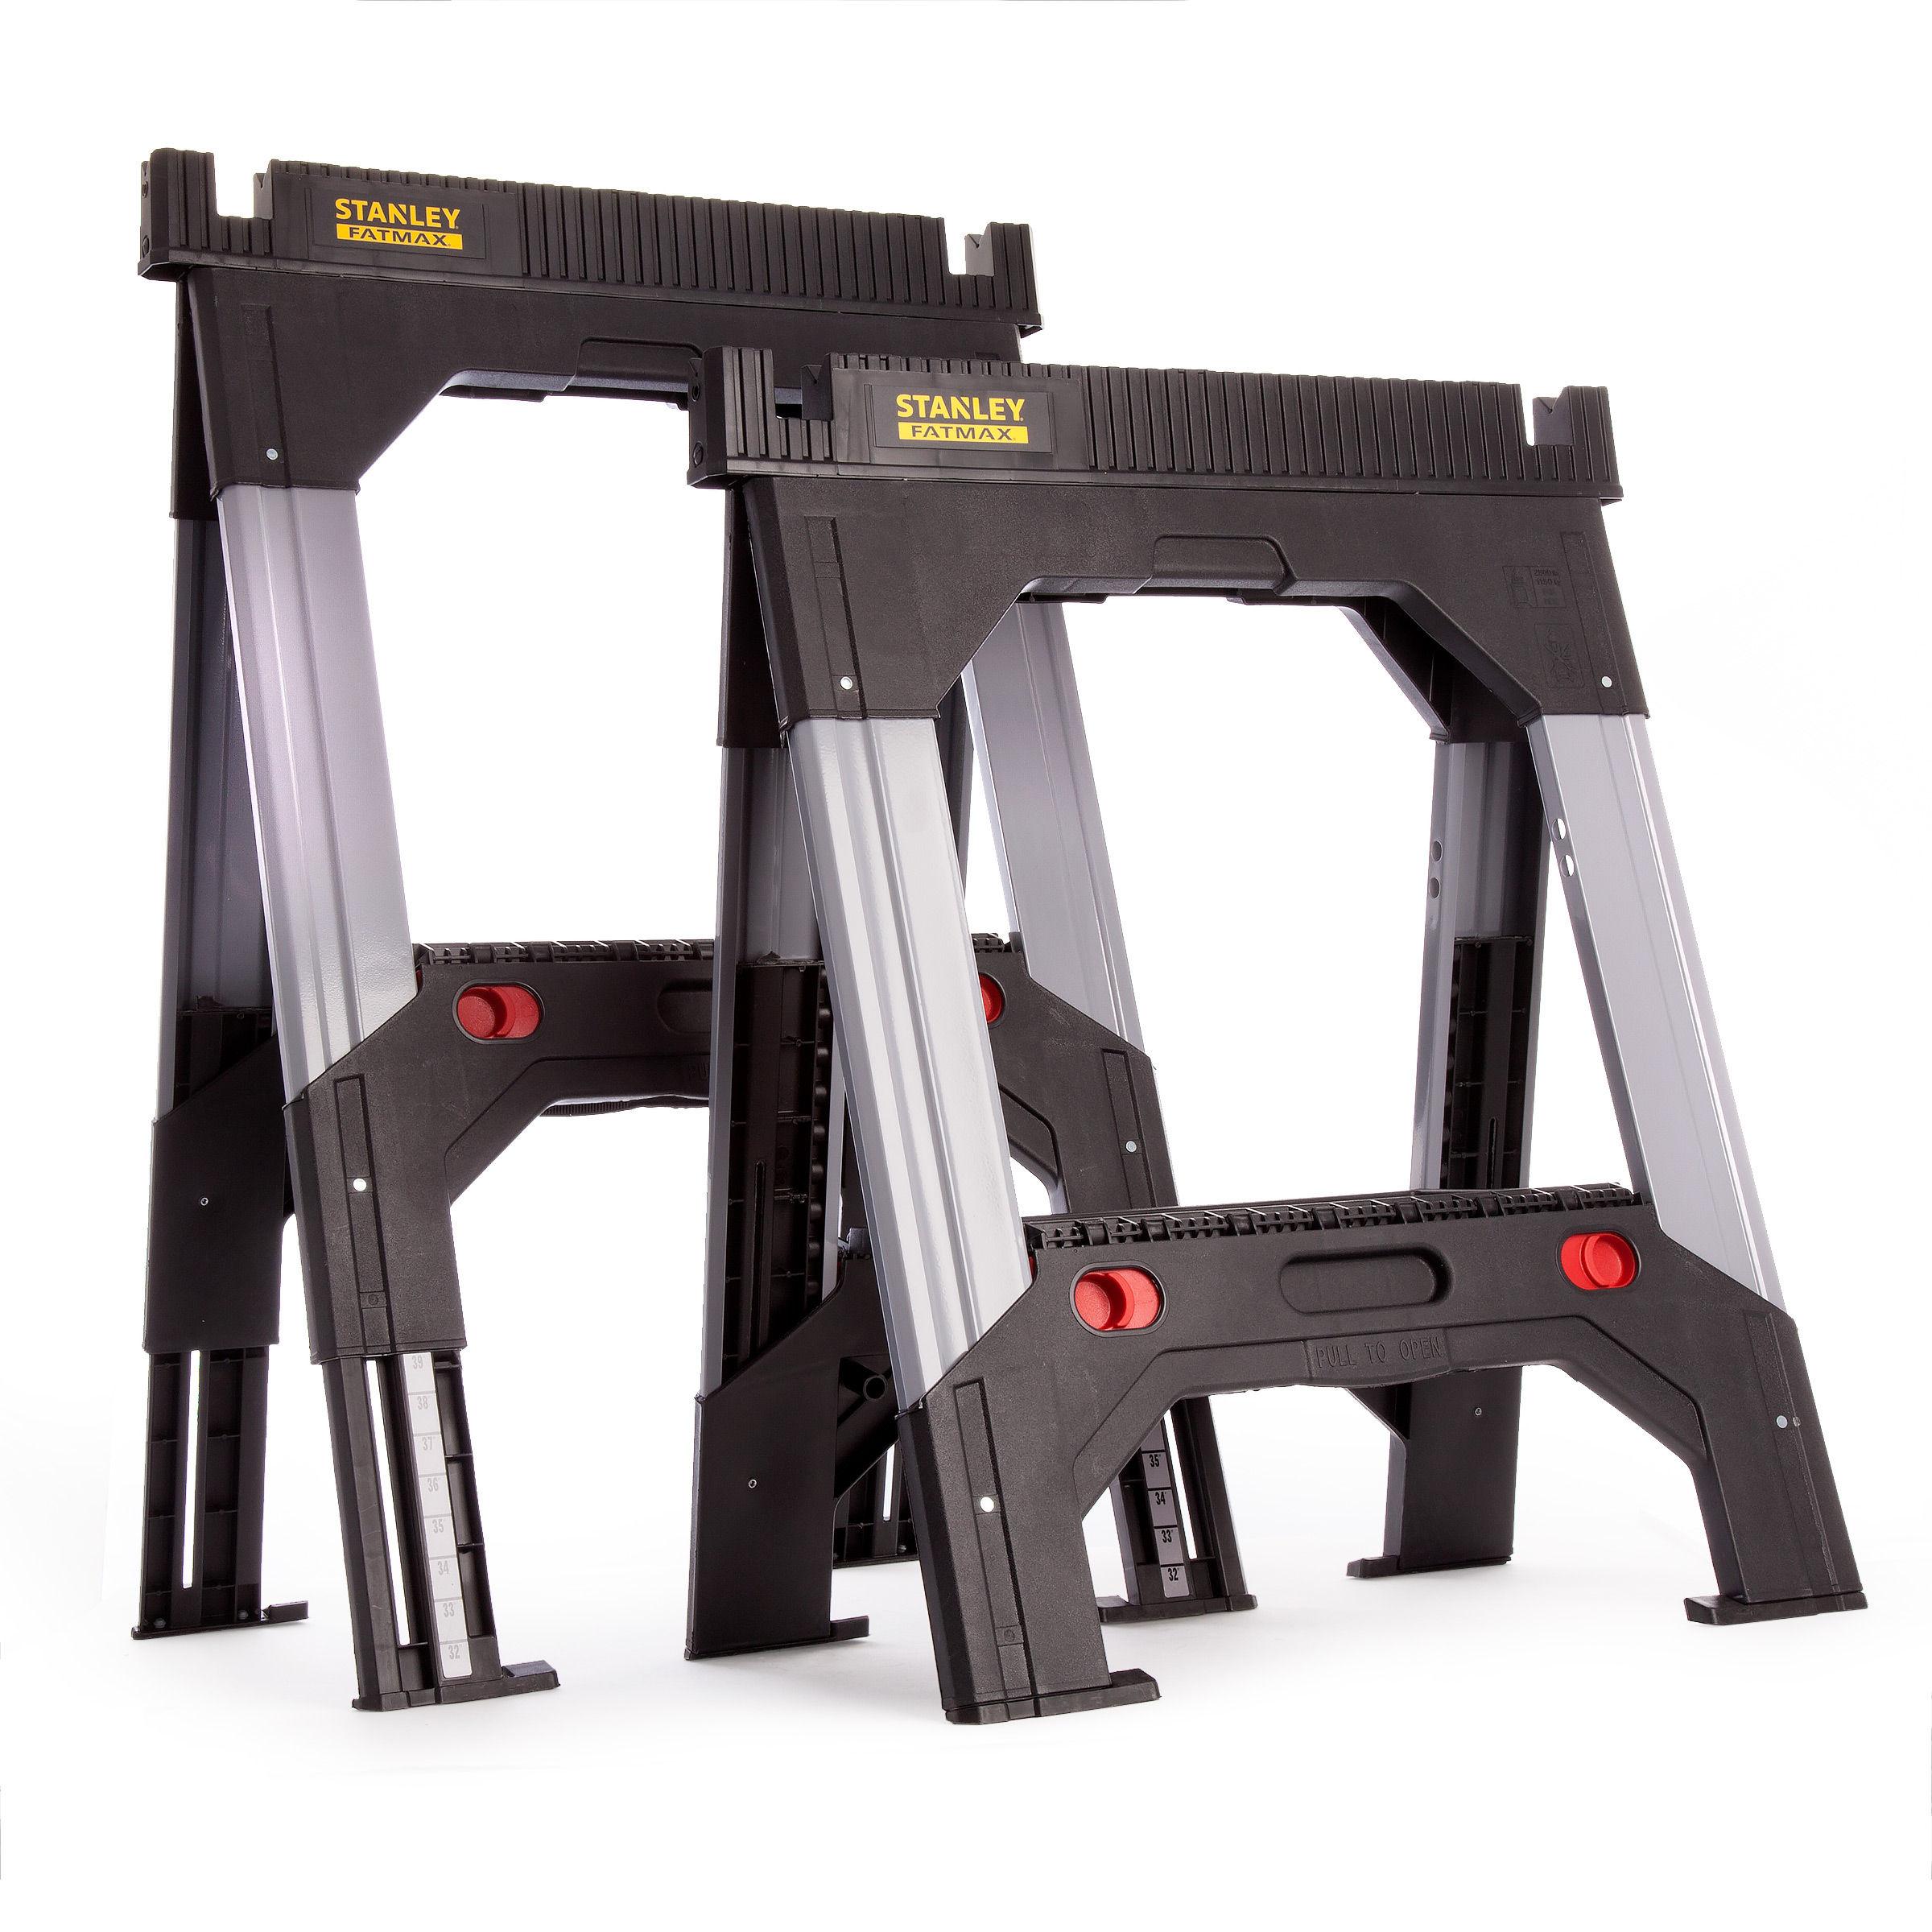 Stanley 1-92-980 Fatmax Aluminium Adjustable Telescopic Saw Horse Twin Pack